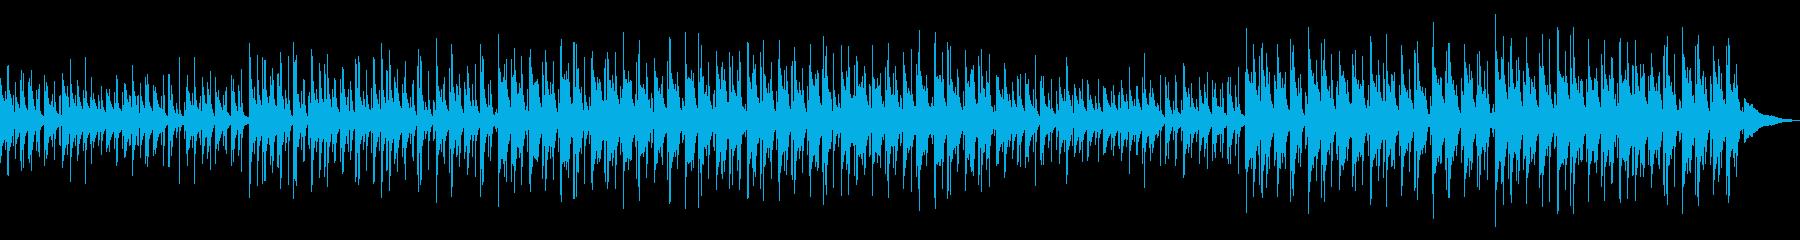 Littleの再生済みの波形